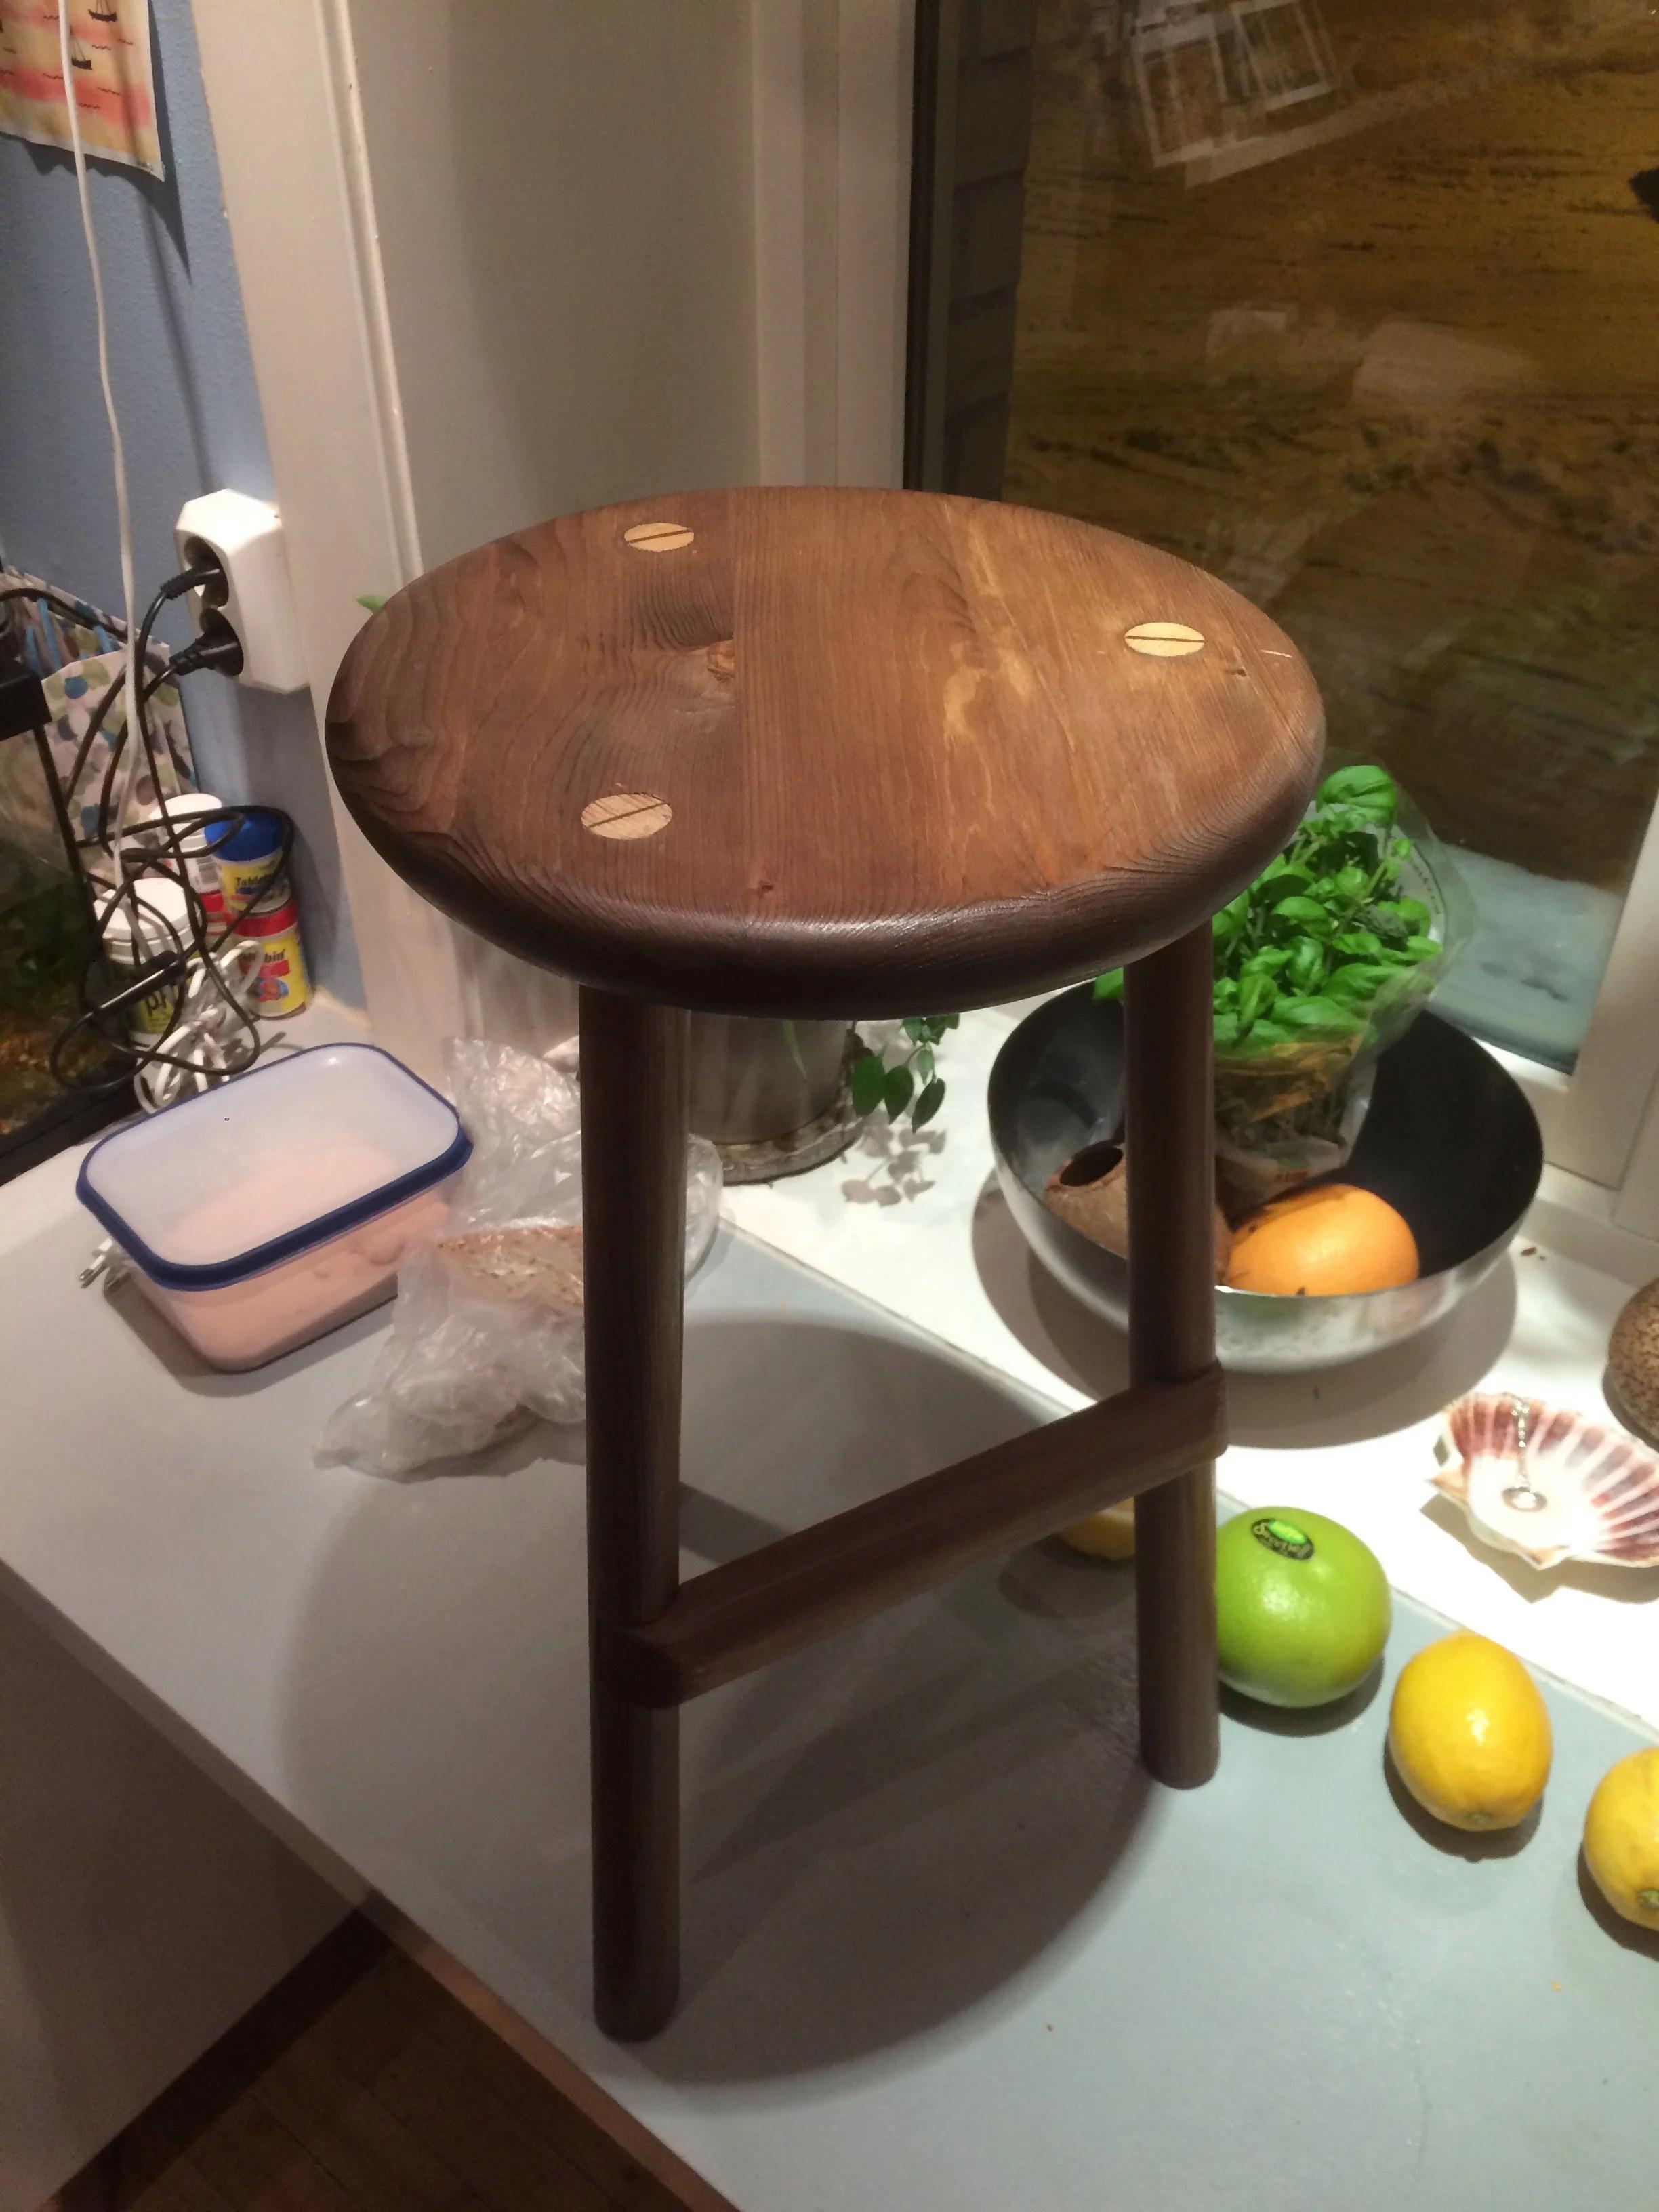 Leftovers from workbench build, spruce. Vinegar & steel finish